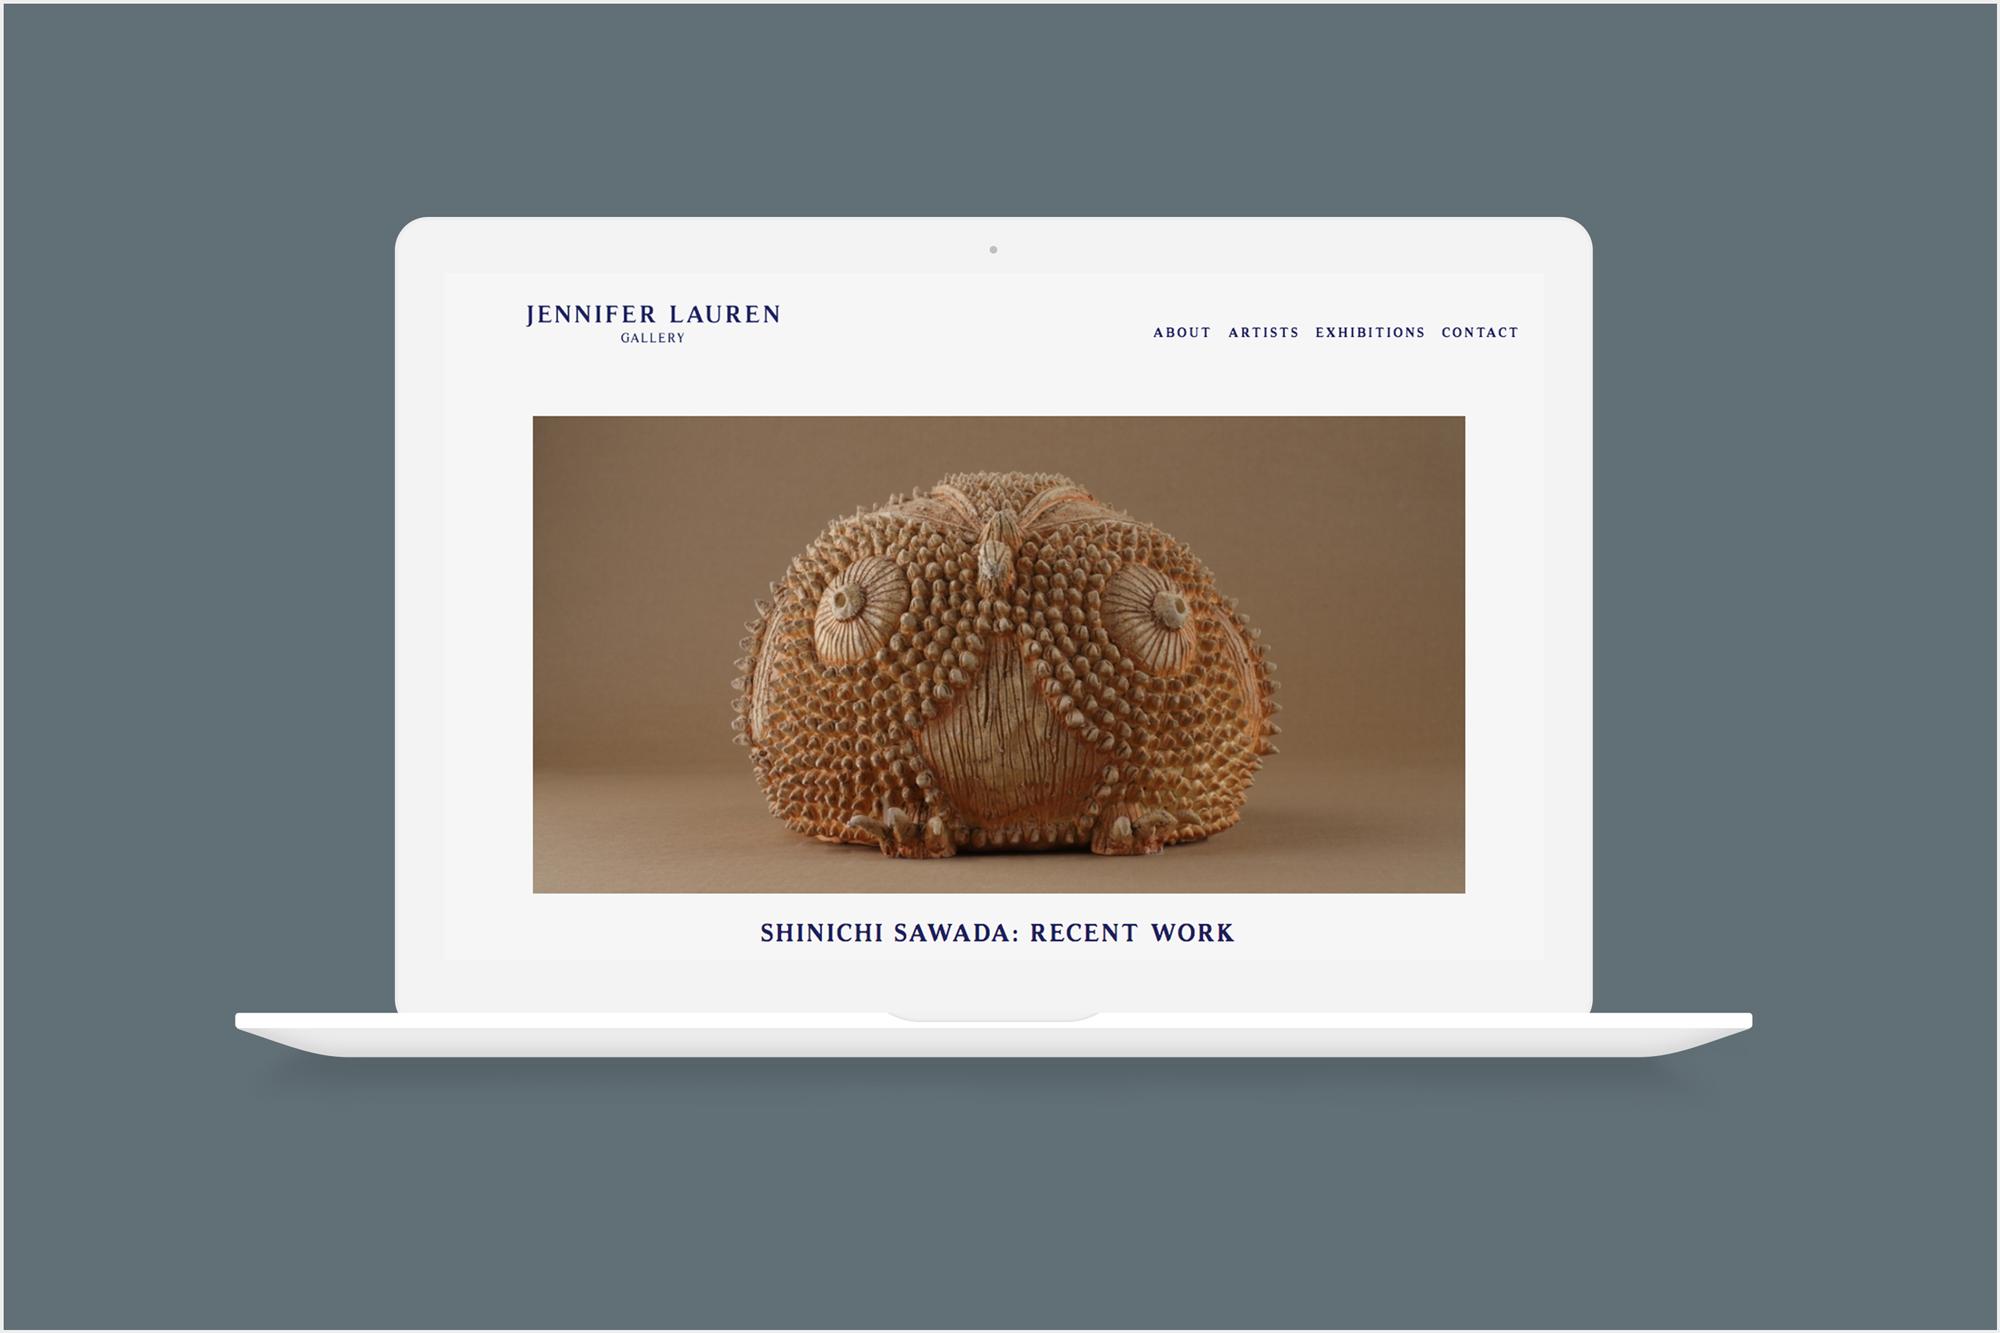 bgsd-project-jennifer-lauren-gallery-homepage.png